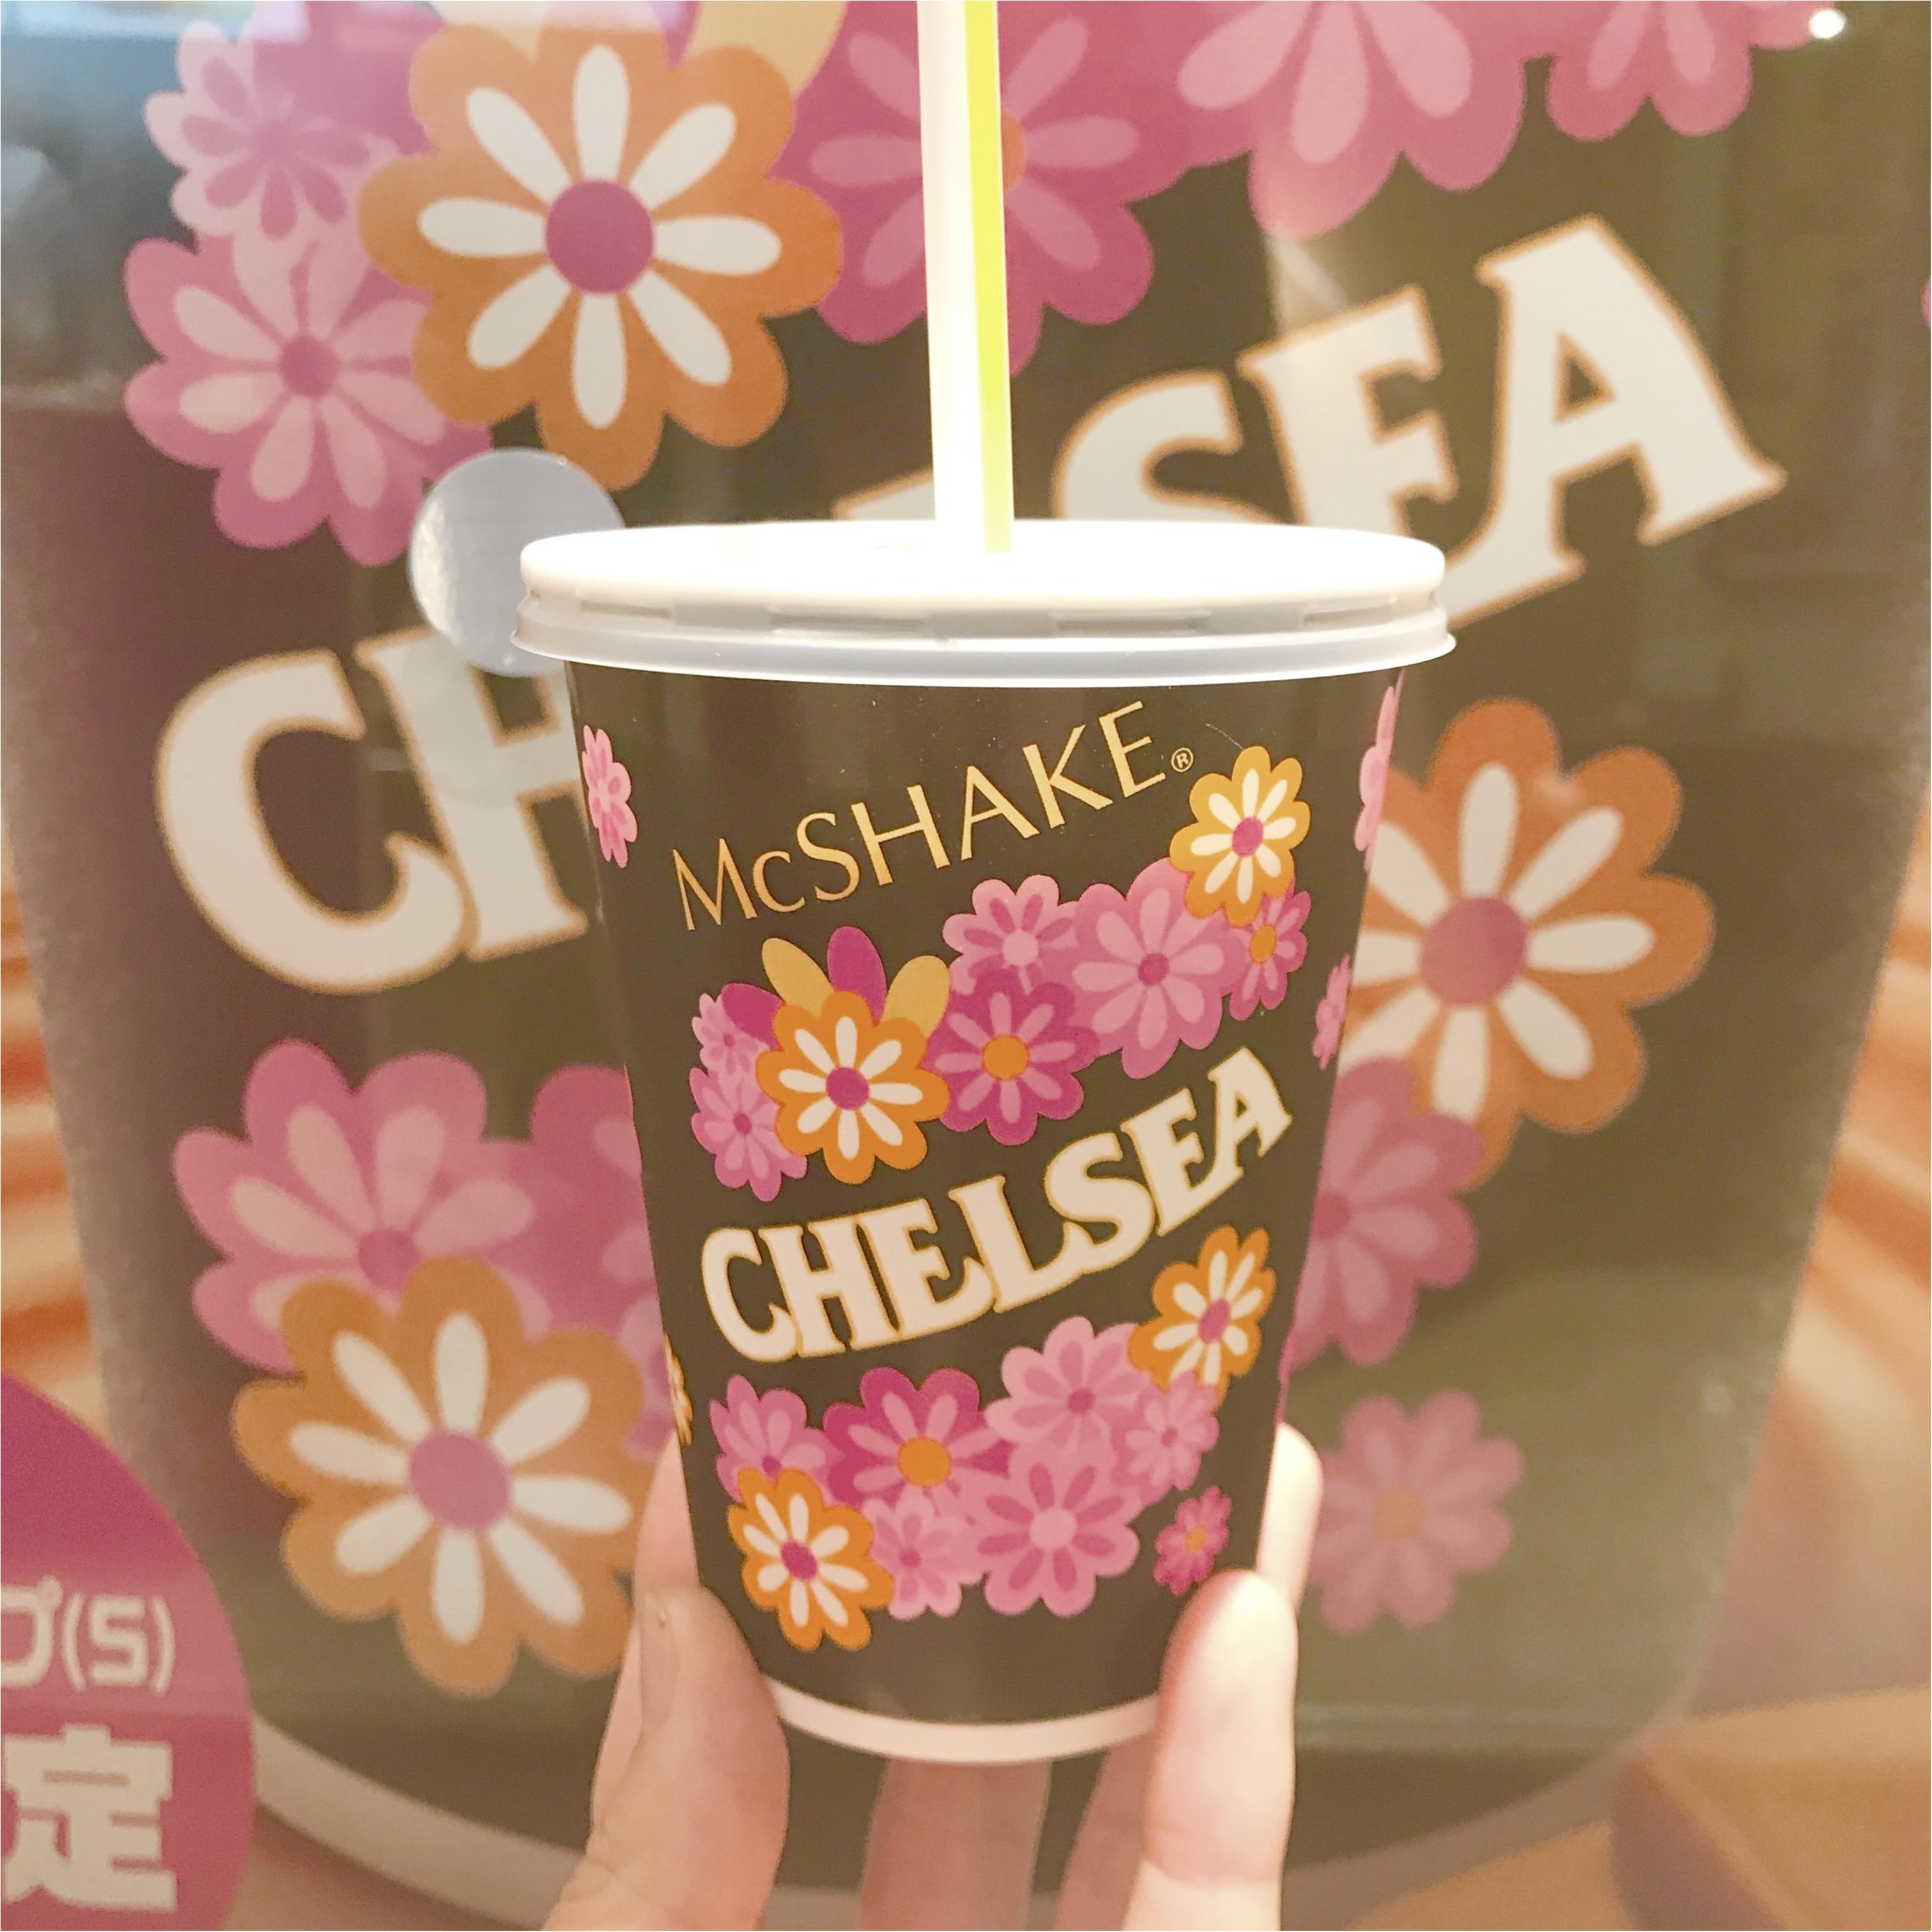 【FOOD】マクドナルドからチェルシーバタースカッチシェイクが期間限定登場中❤︎!_1